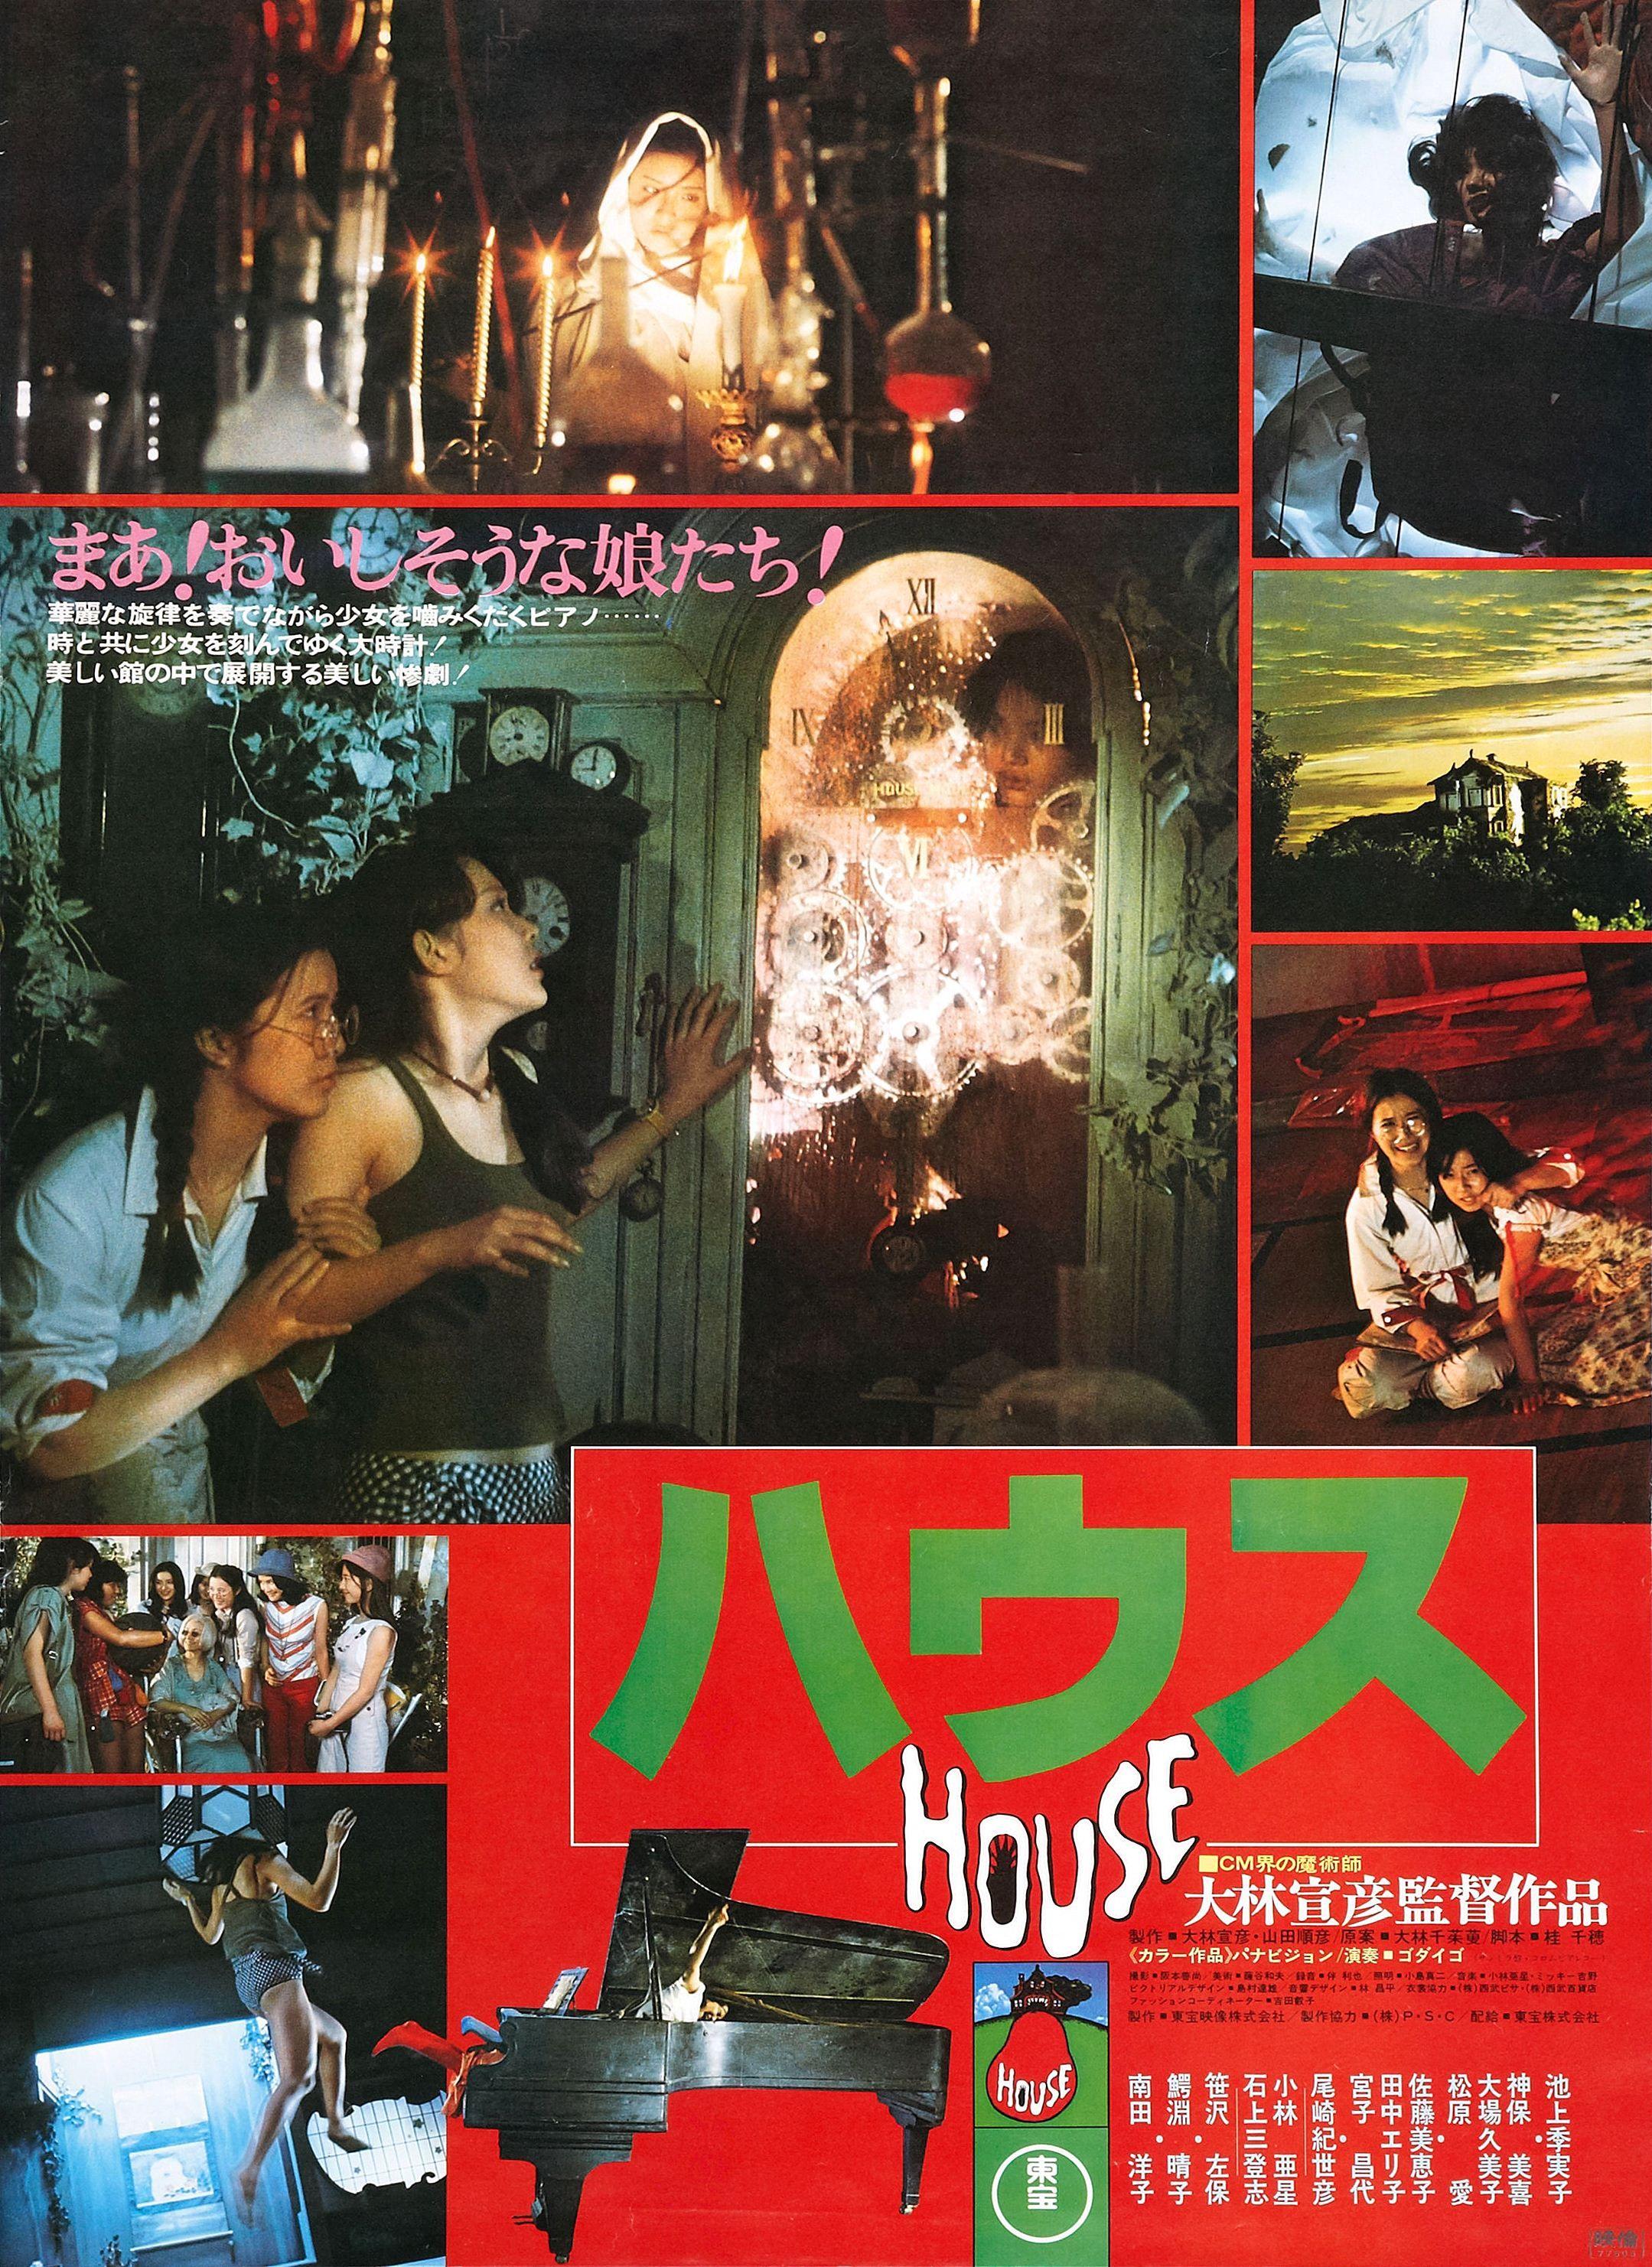 House (1977) Japanese horror movies, Japanese movie